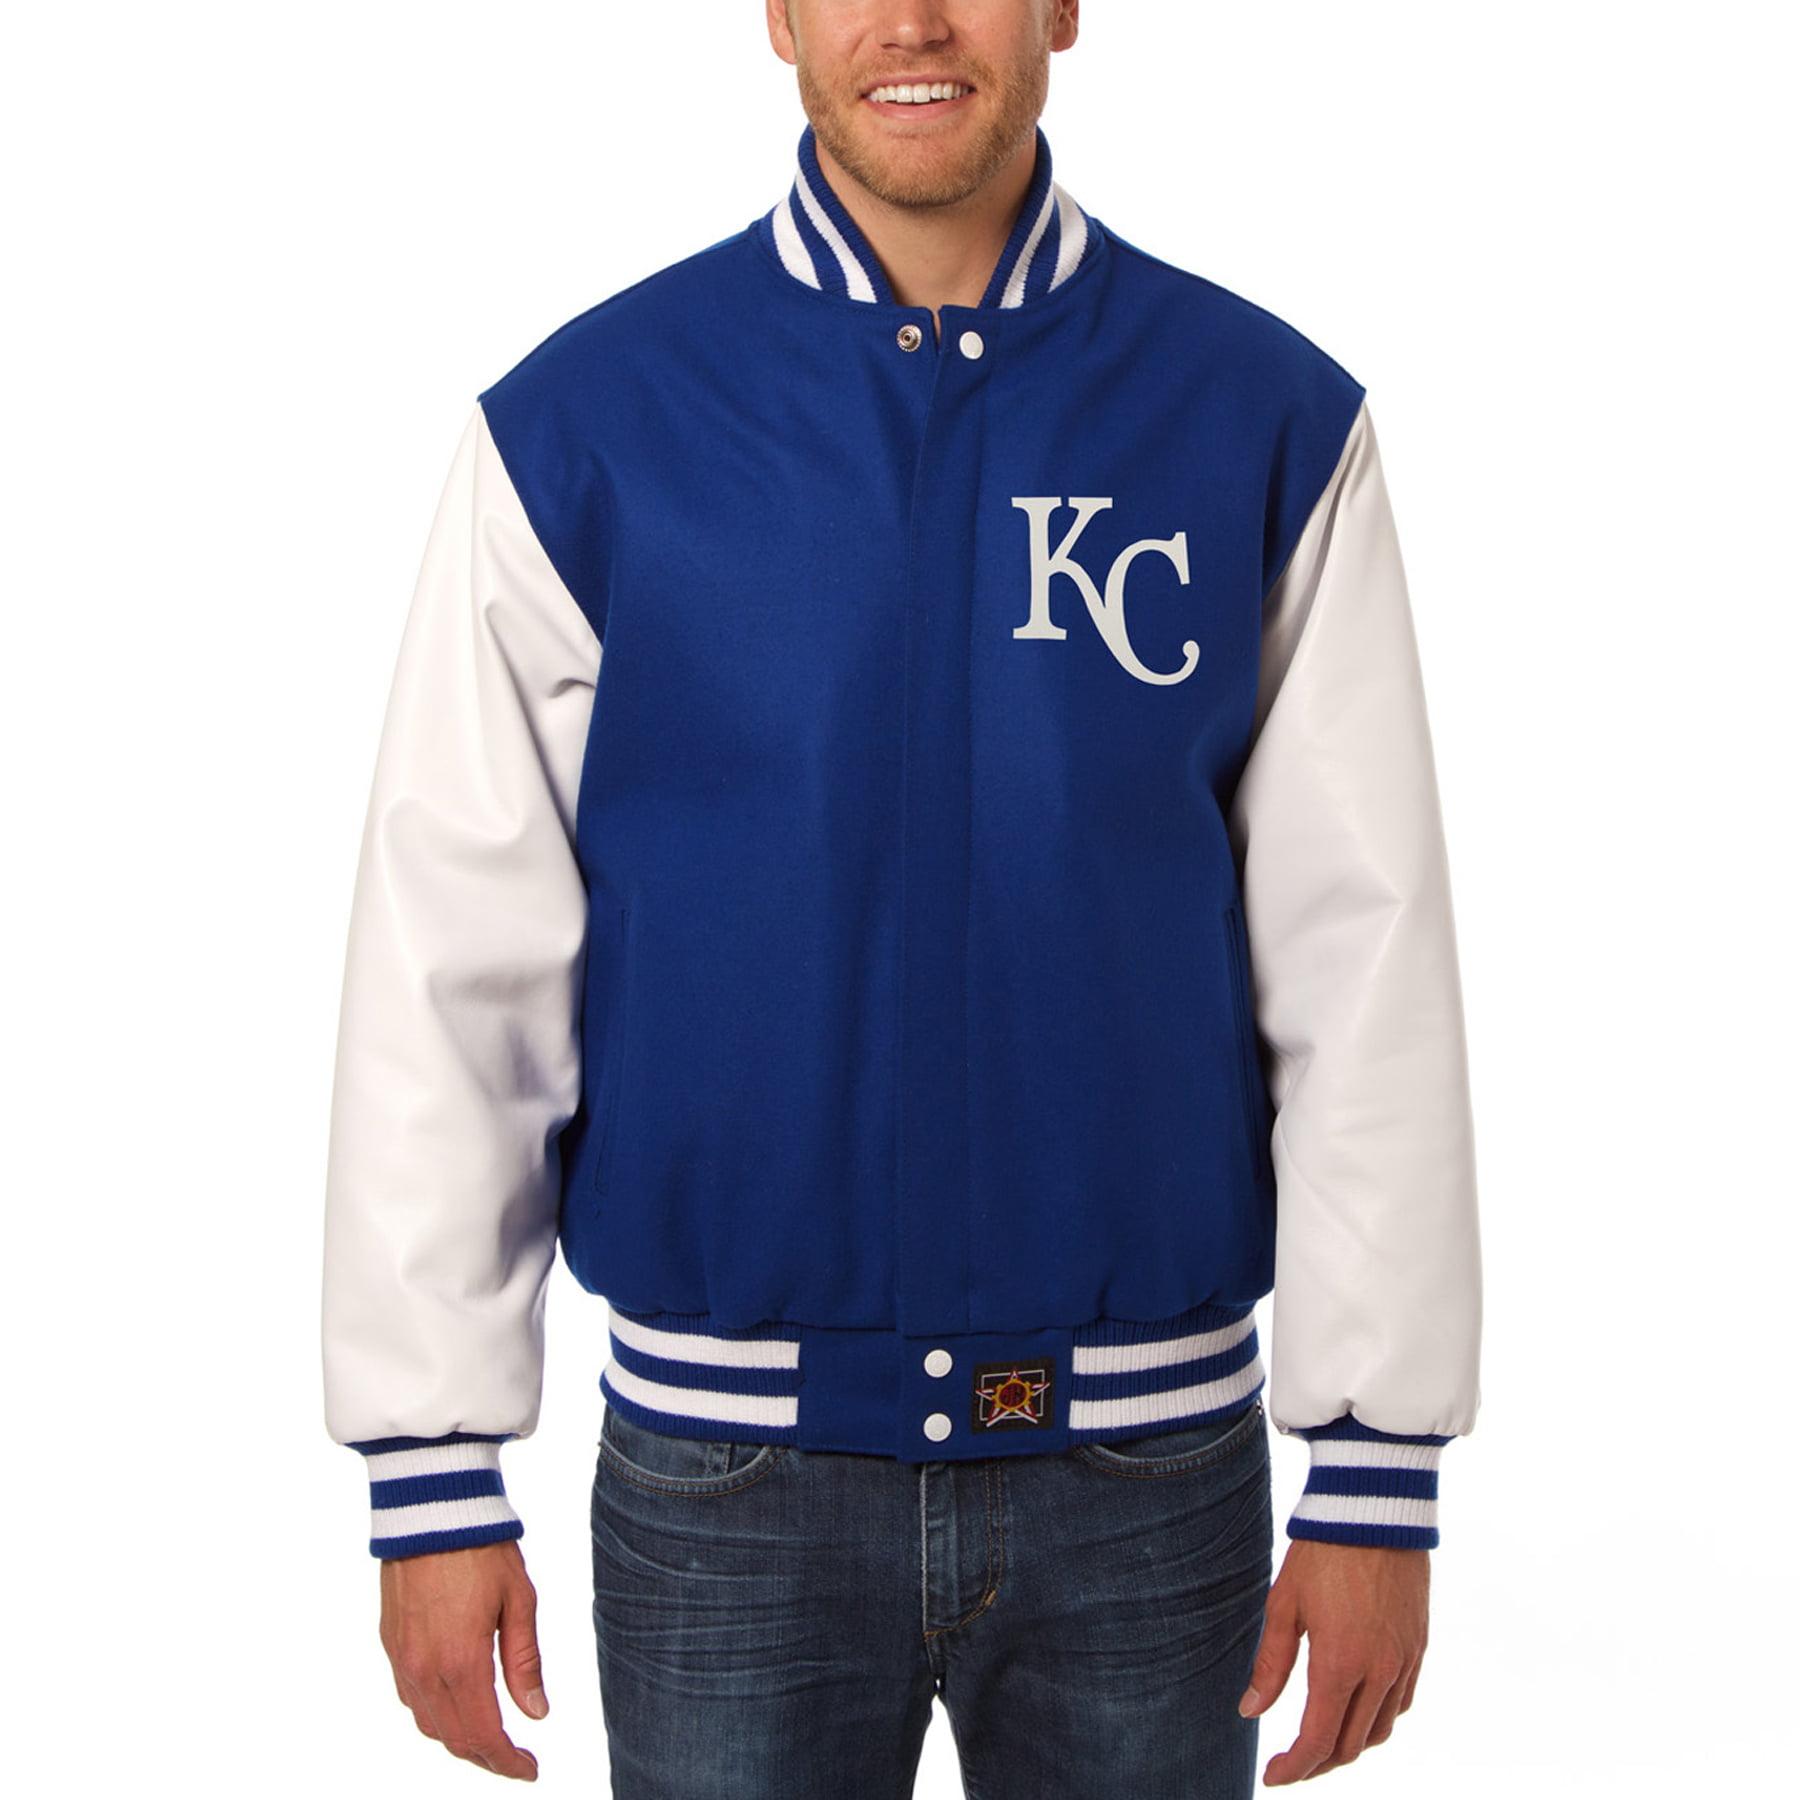 Kansas City Royals JH Design Two-Tone Wool & Leather Jacket - Royal/White